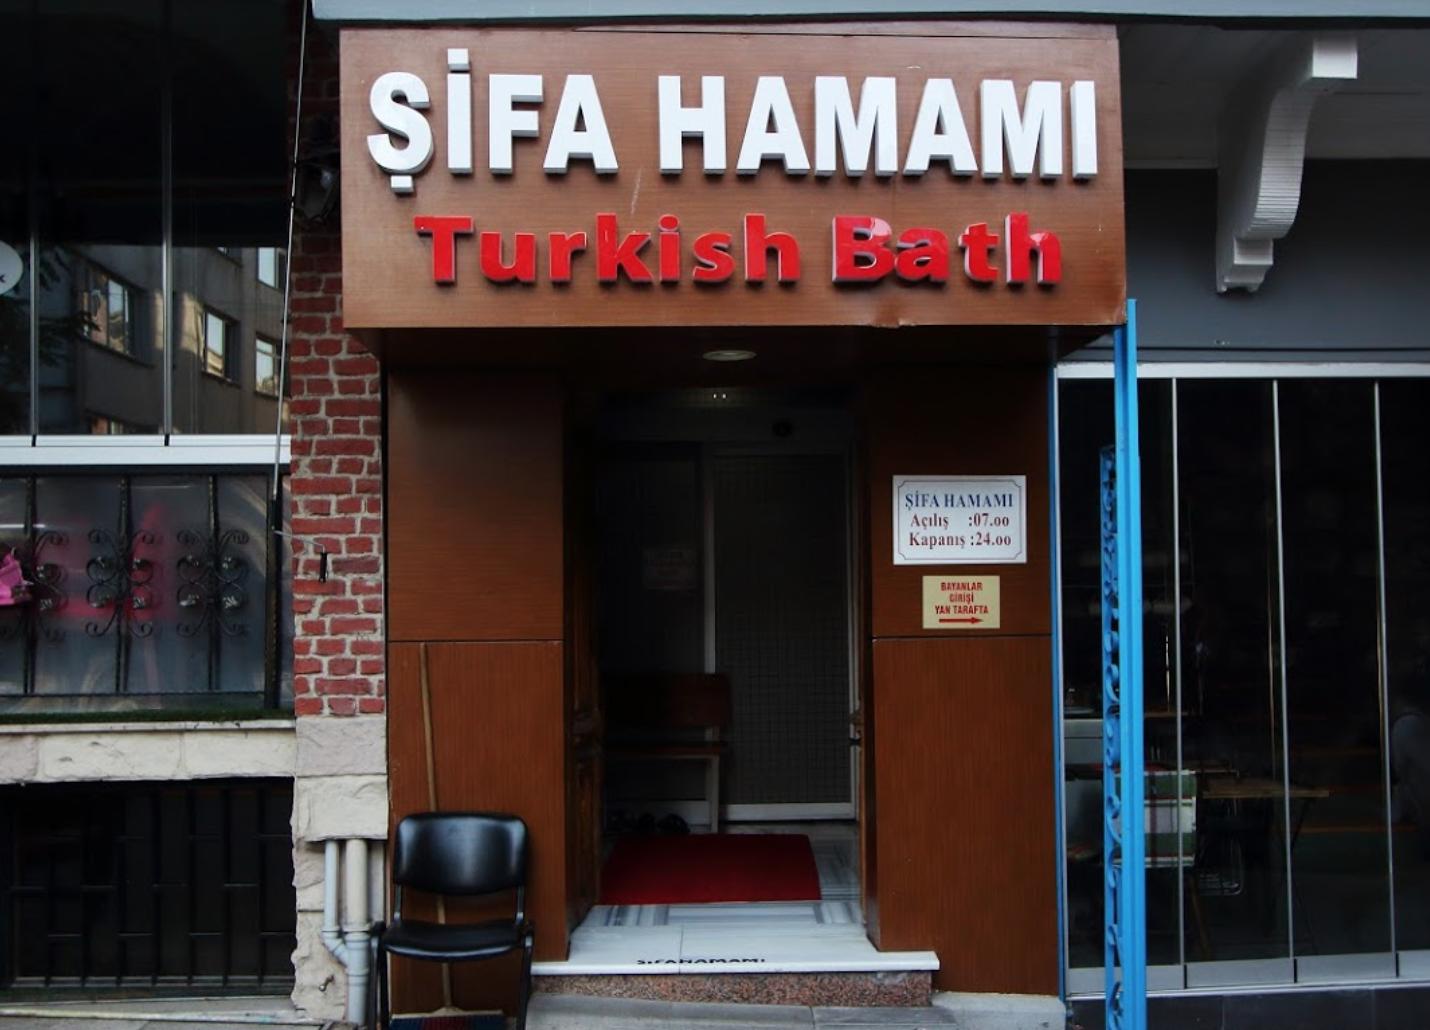 Хамам Юскюдар Шифа в Стамбуле